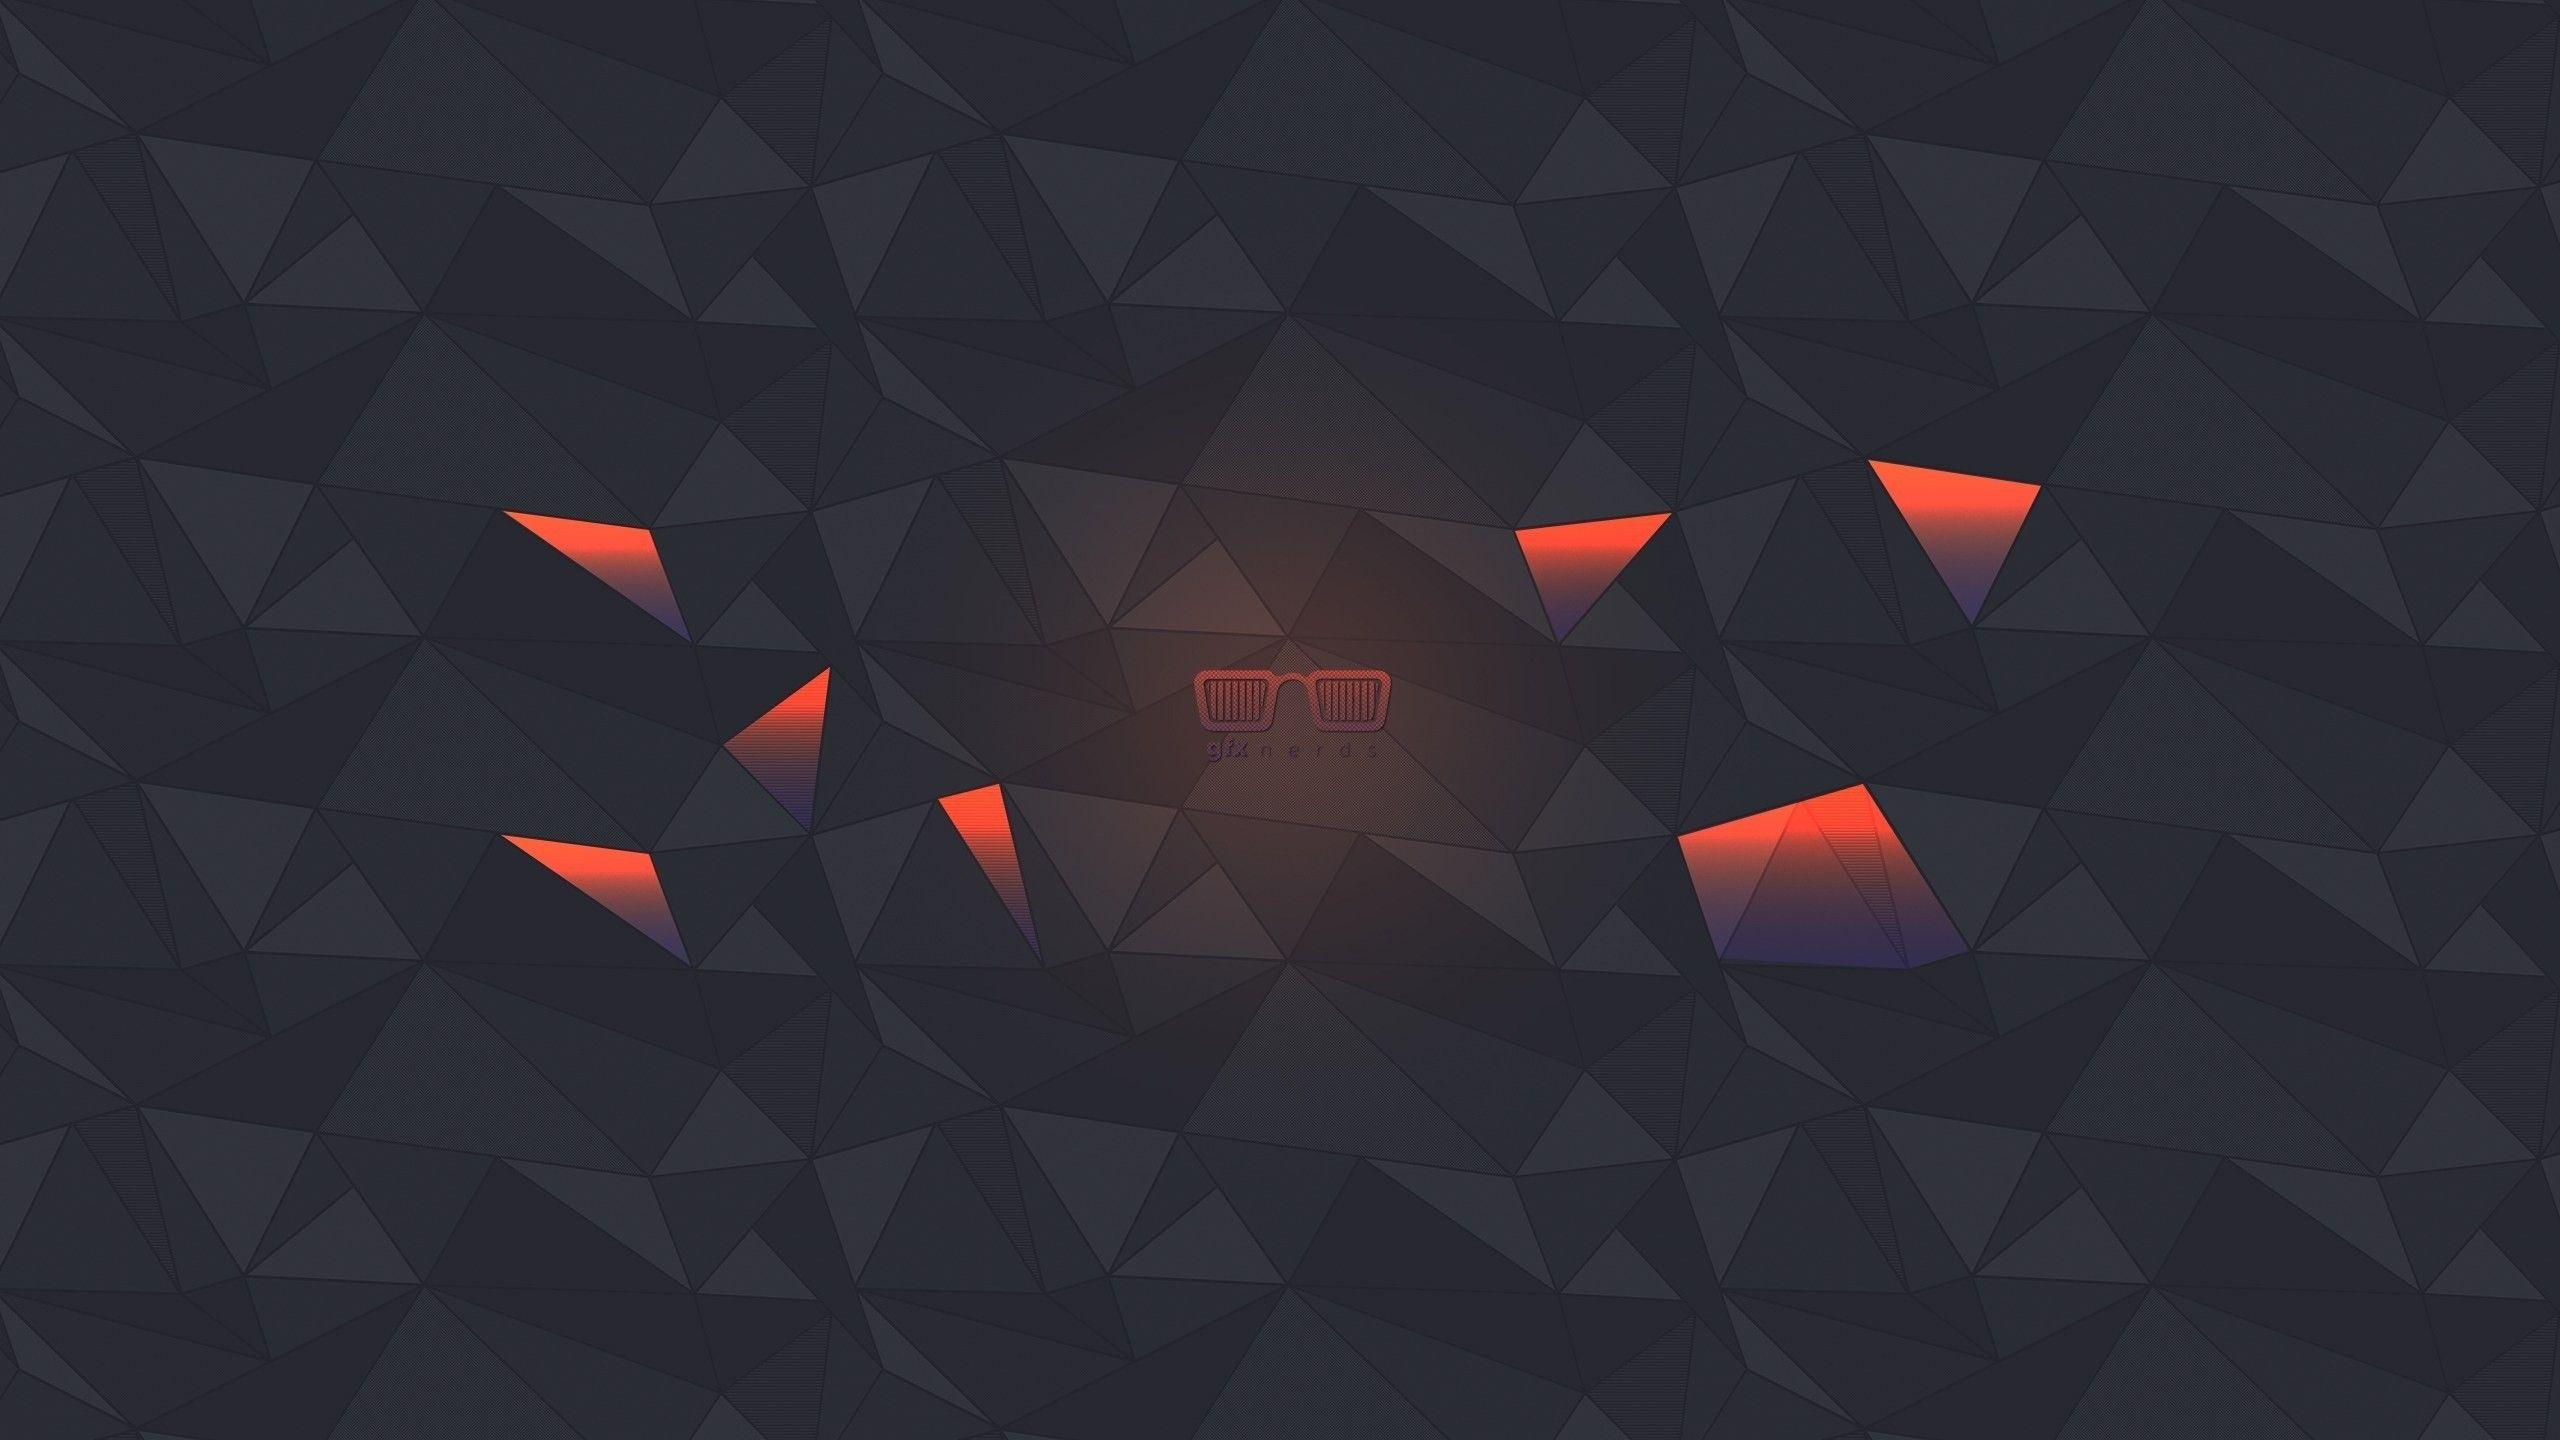 Hd Wallpaper For Youtube Banner